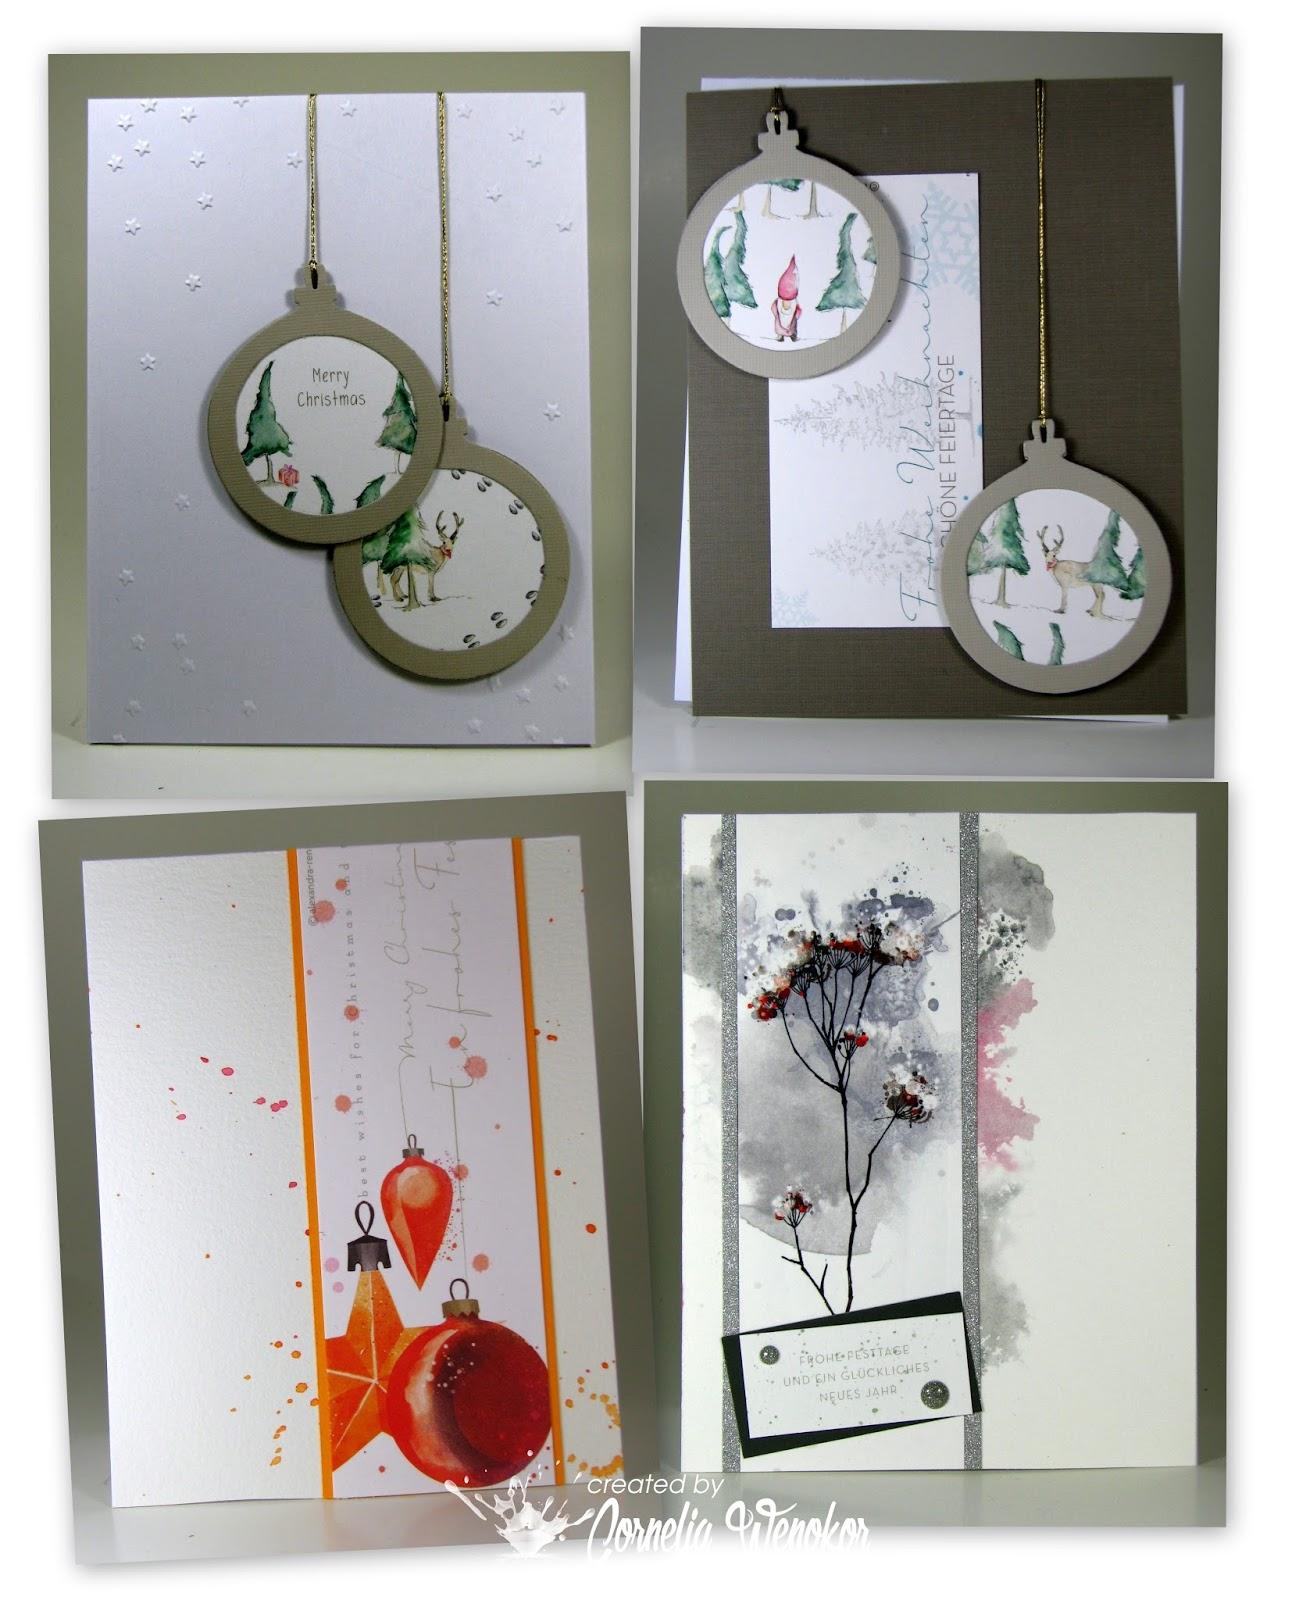 Stempel Spass: Kreativprojekt mit Alexandra Renke: Advent ...  Stempel Spass: ...